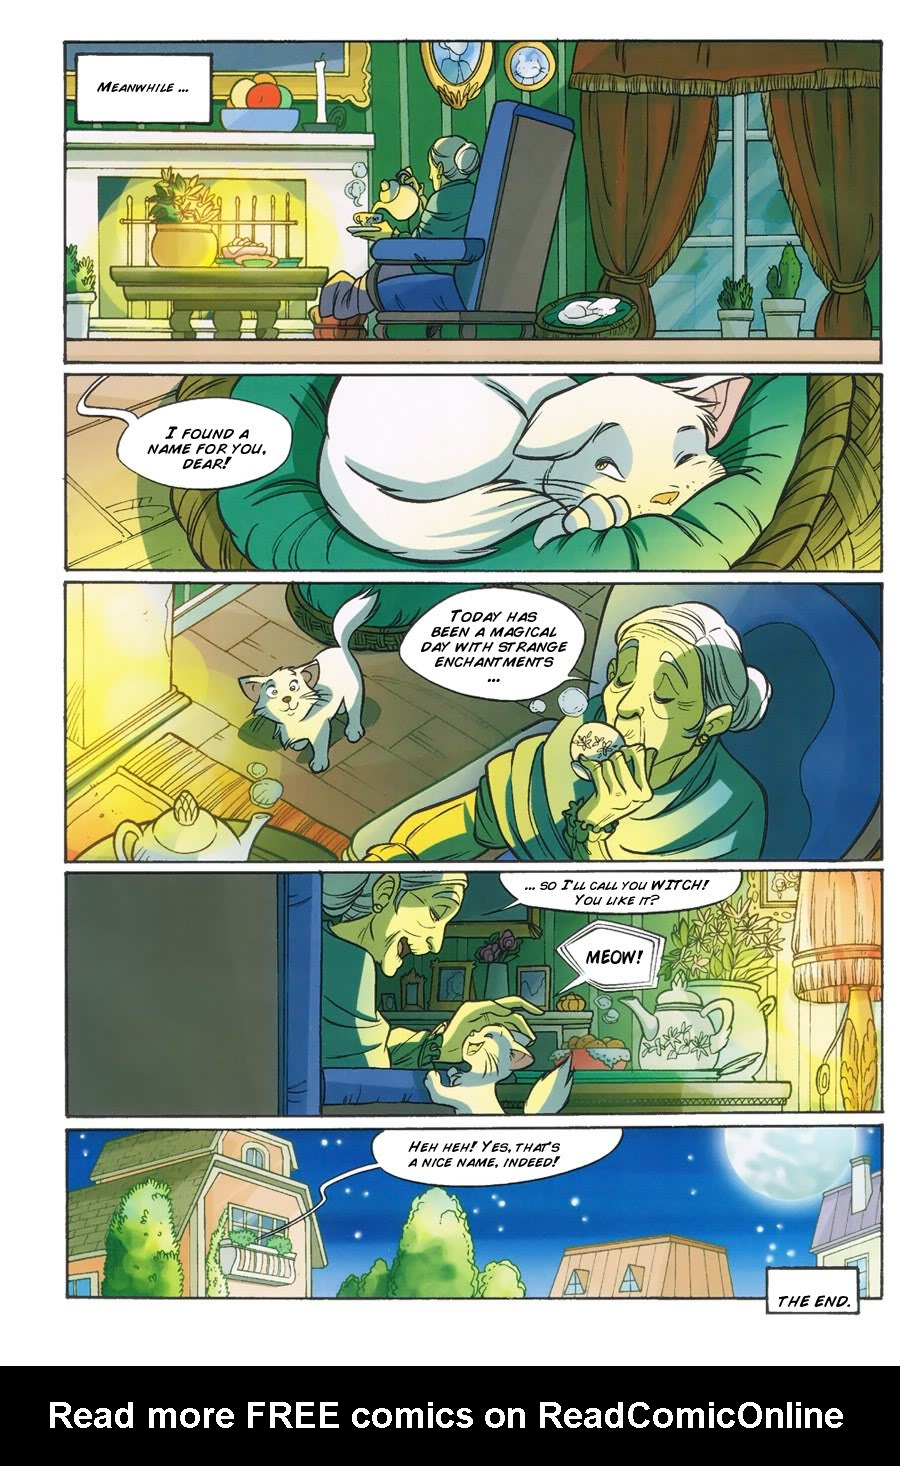 W.i.t.c.h. 100 Page 44